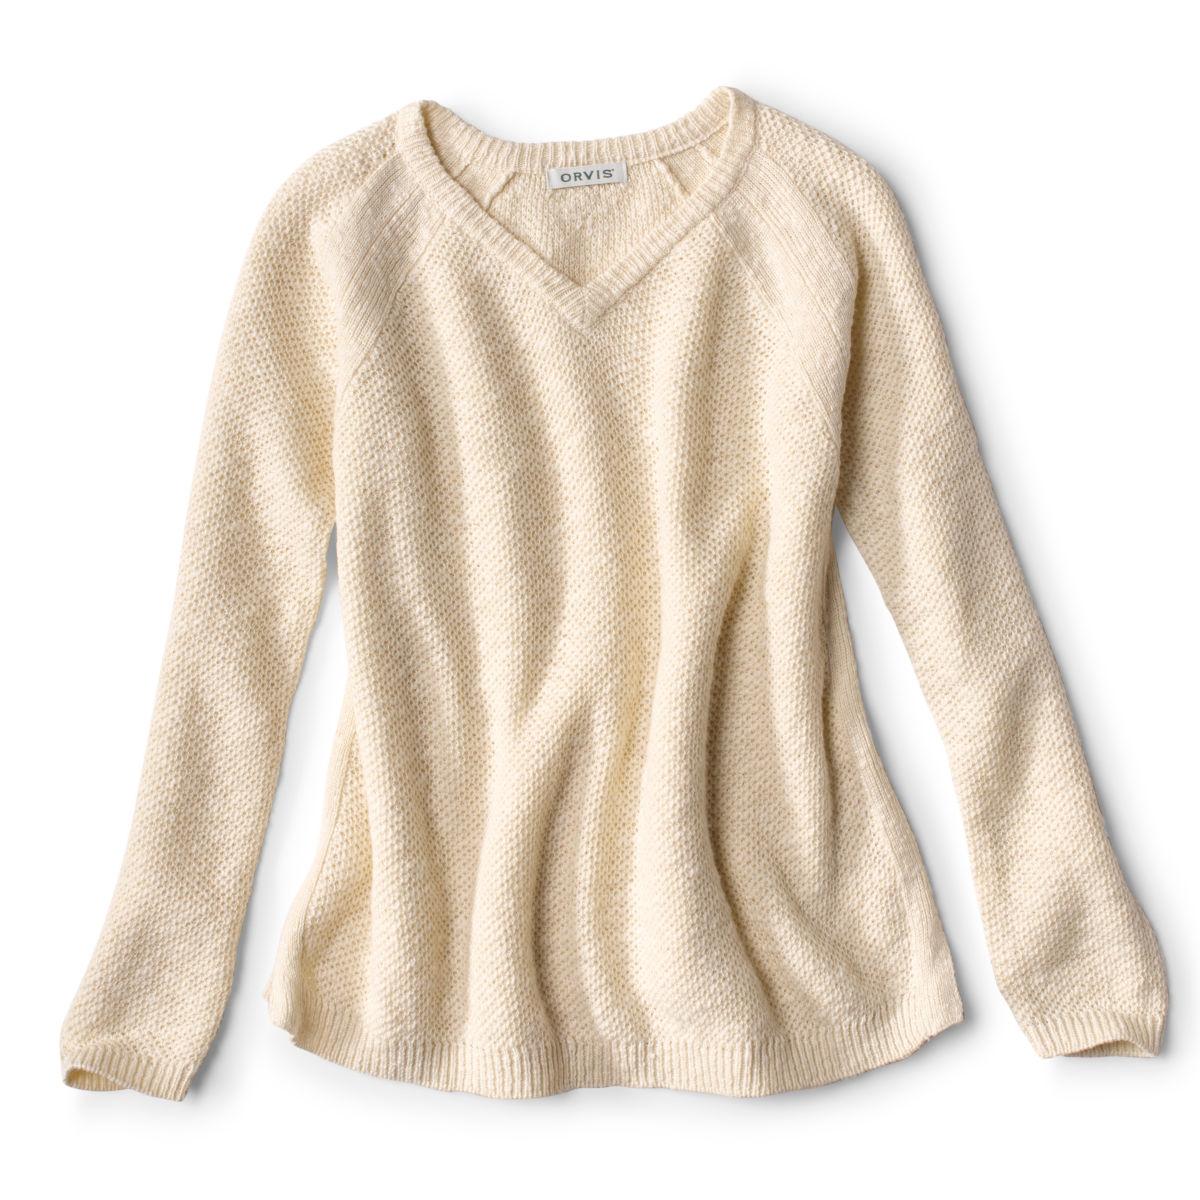 Easy V-Neck Sweater - SNOWimage number 0